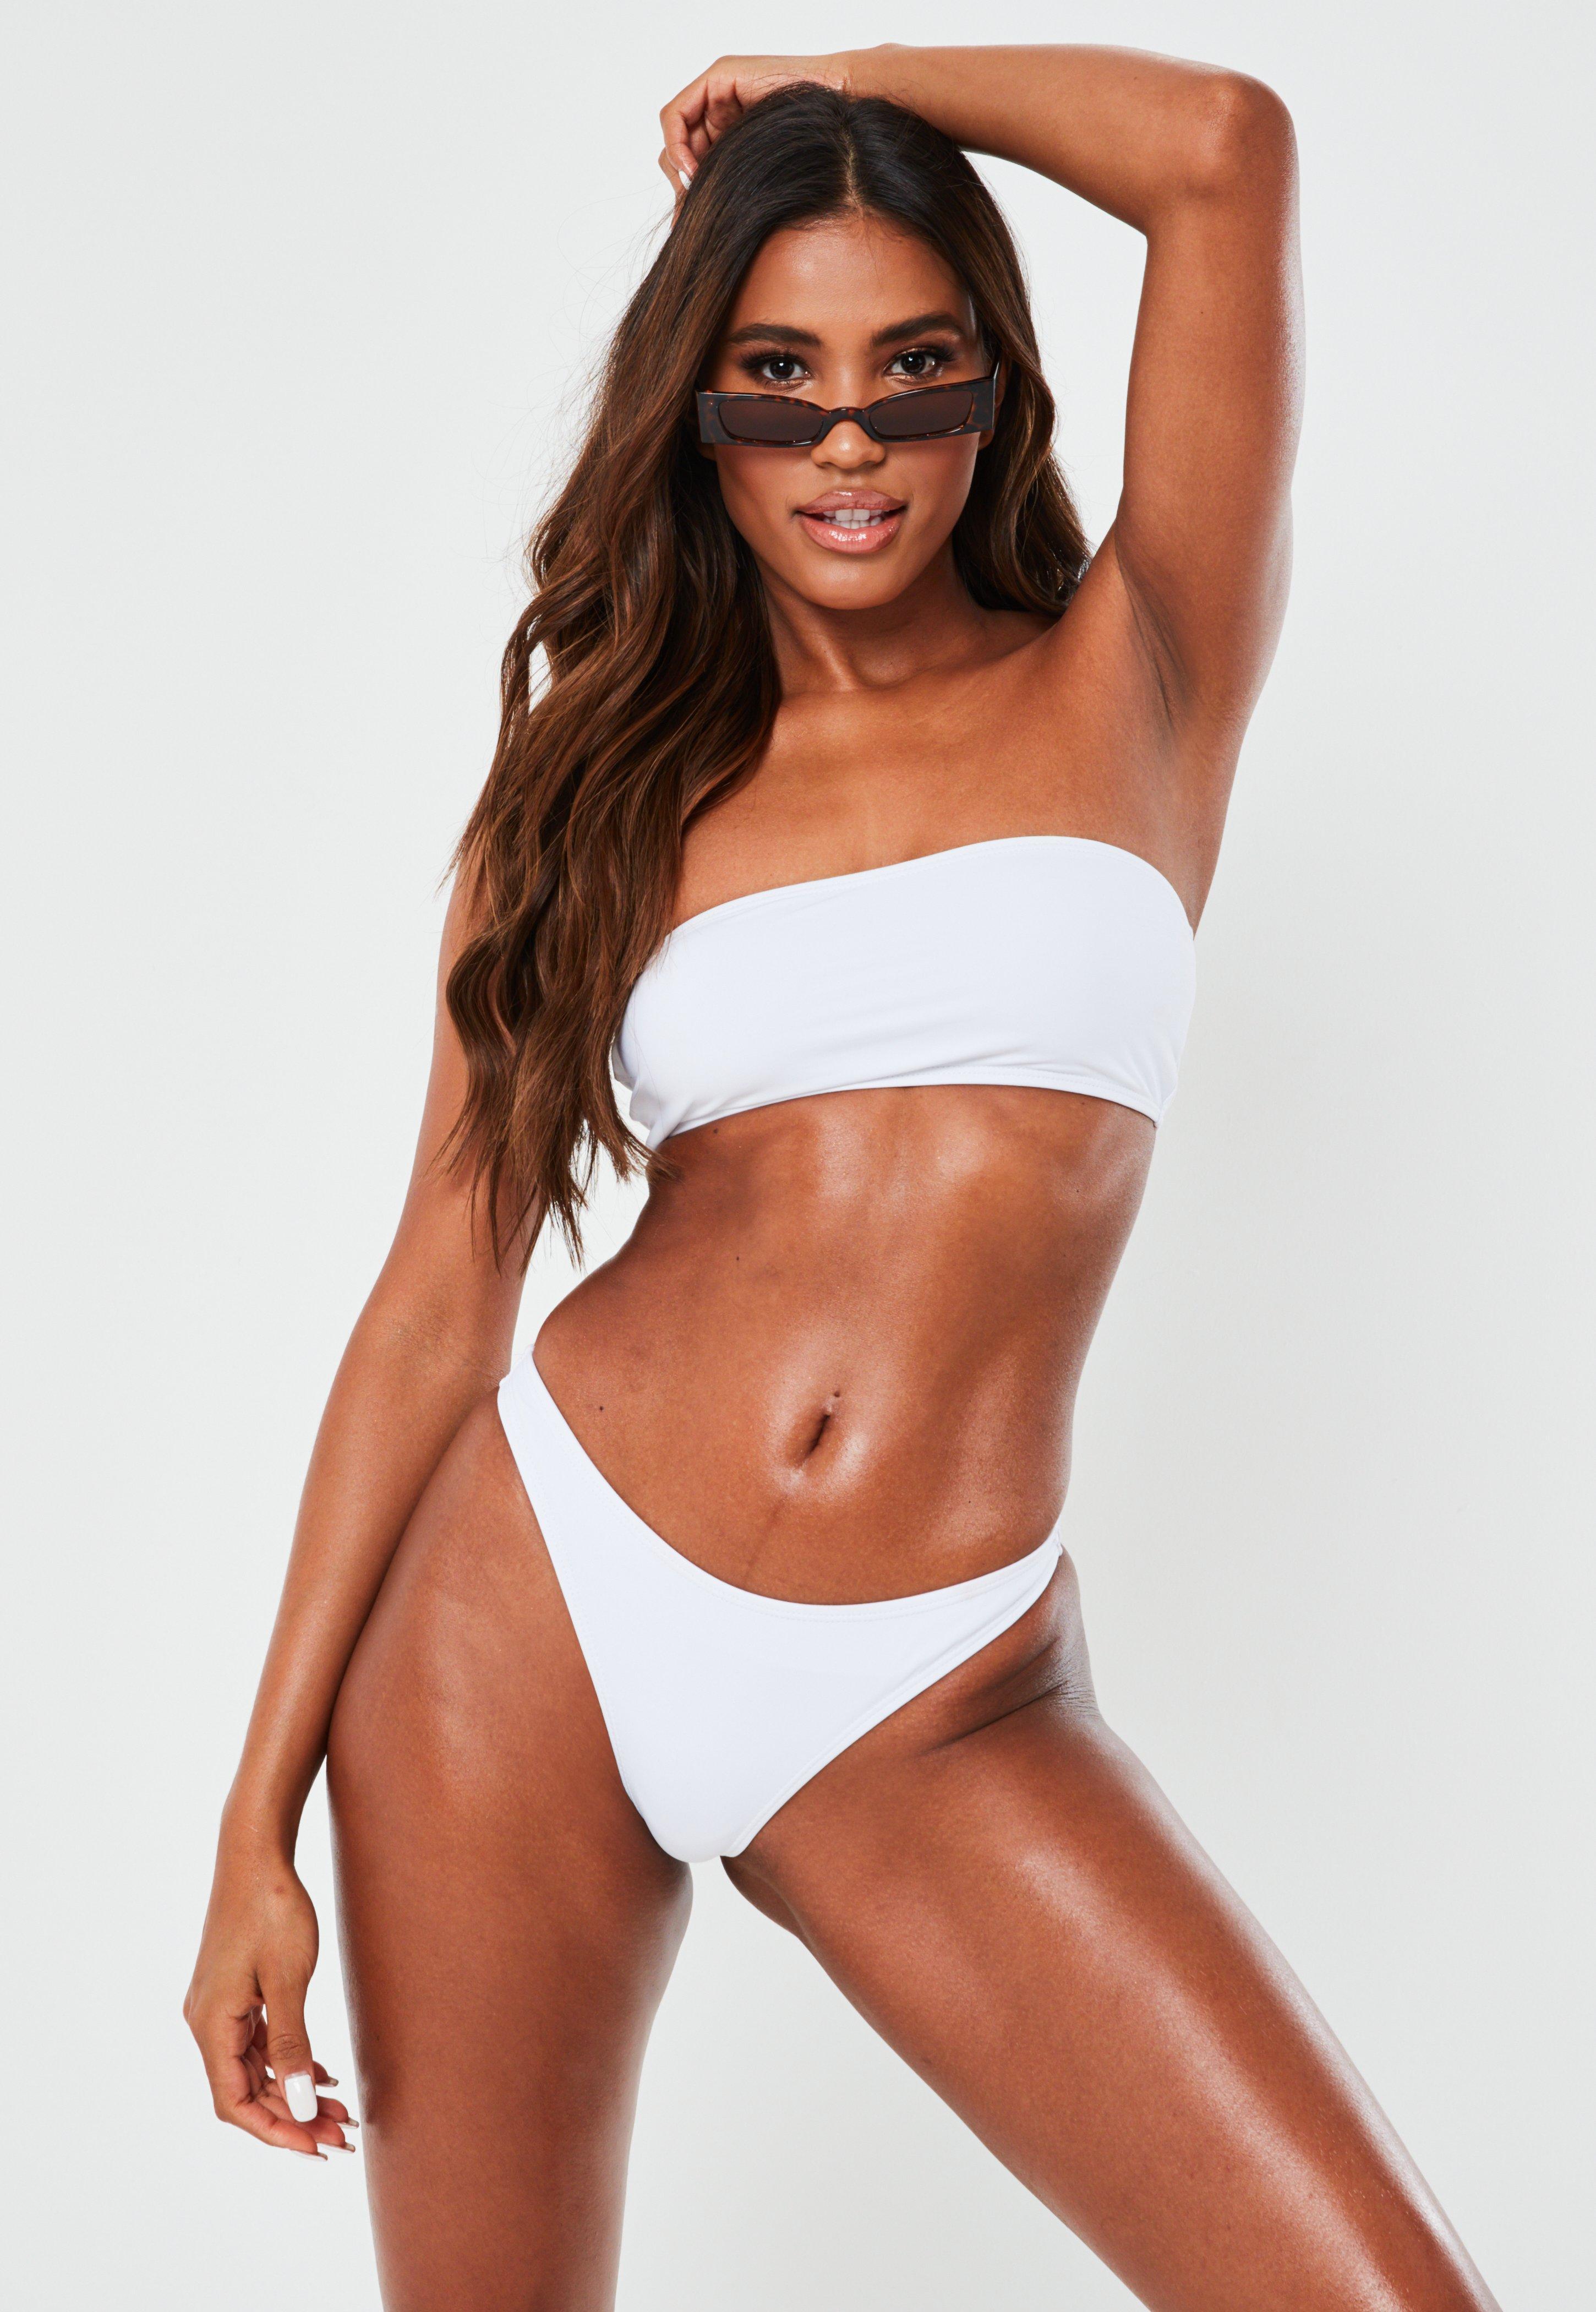 Style Bandeau Top Top Style Bikini Blanc Top Bikini Blanc Bandeau 0kO8Pnw